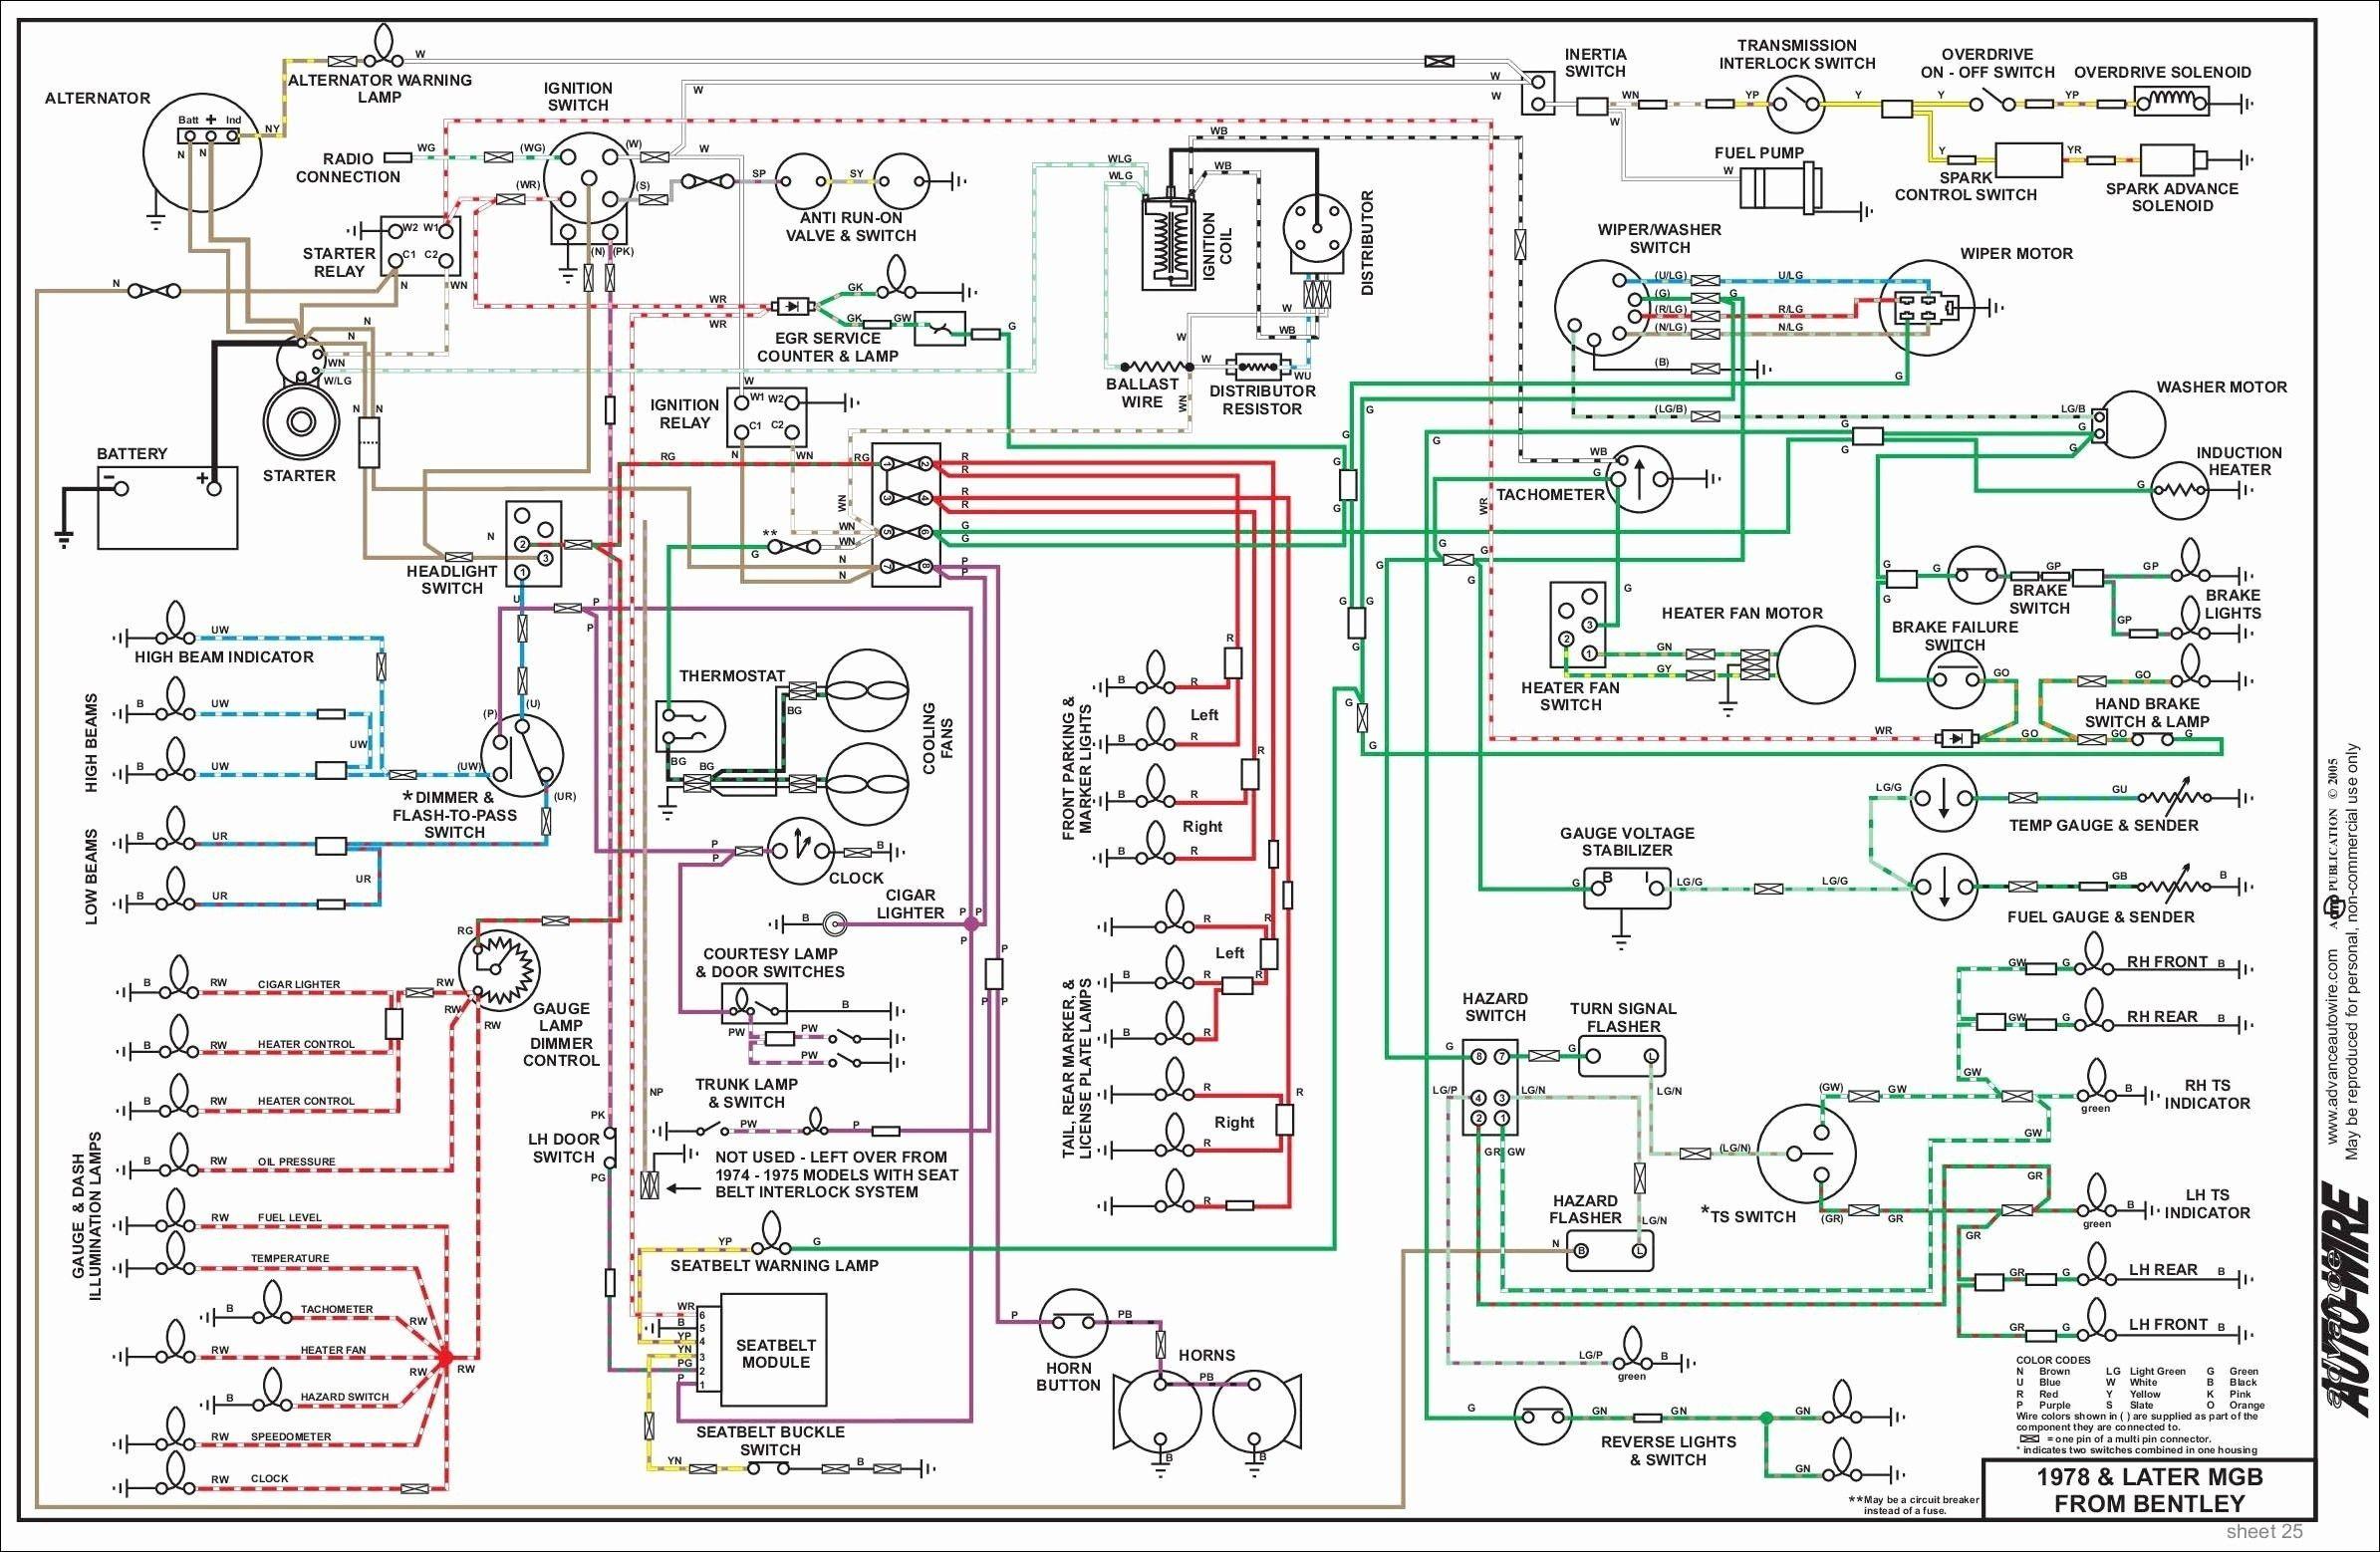 Wiring Diagram for 1986 Club Car New Vans Aircraft Wiring Diagram Diagramsample Of Wiring Diagram for 1986 Club Car